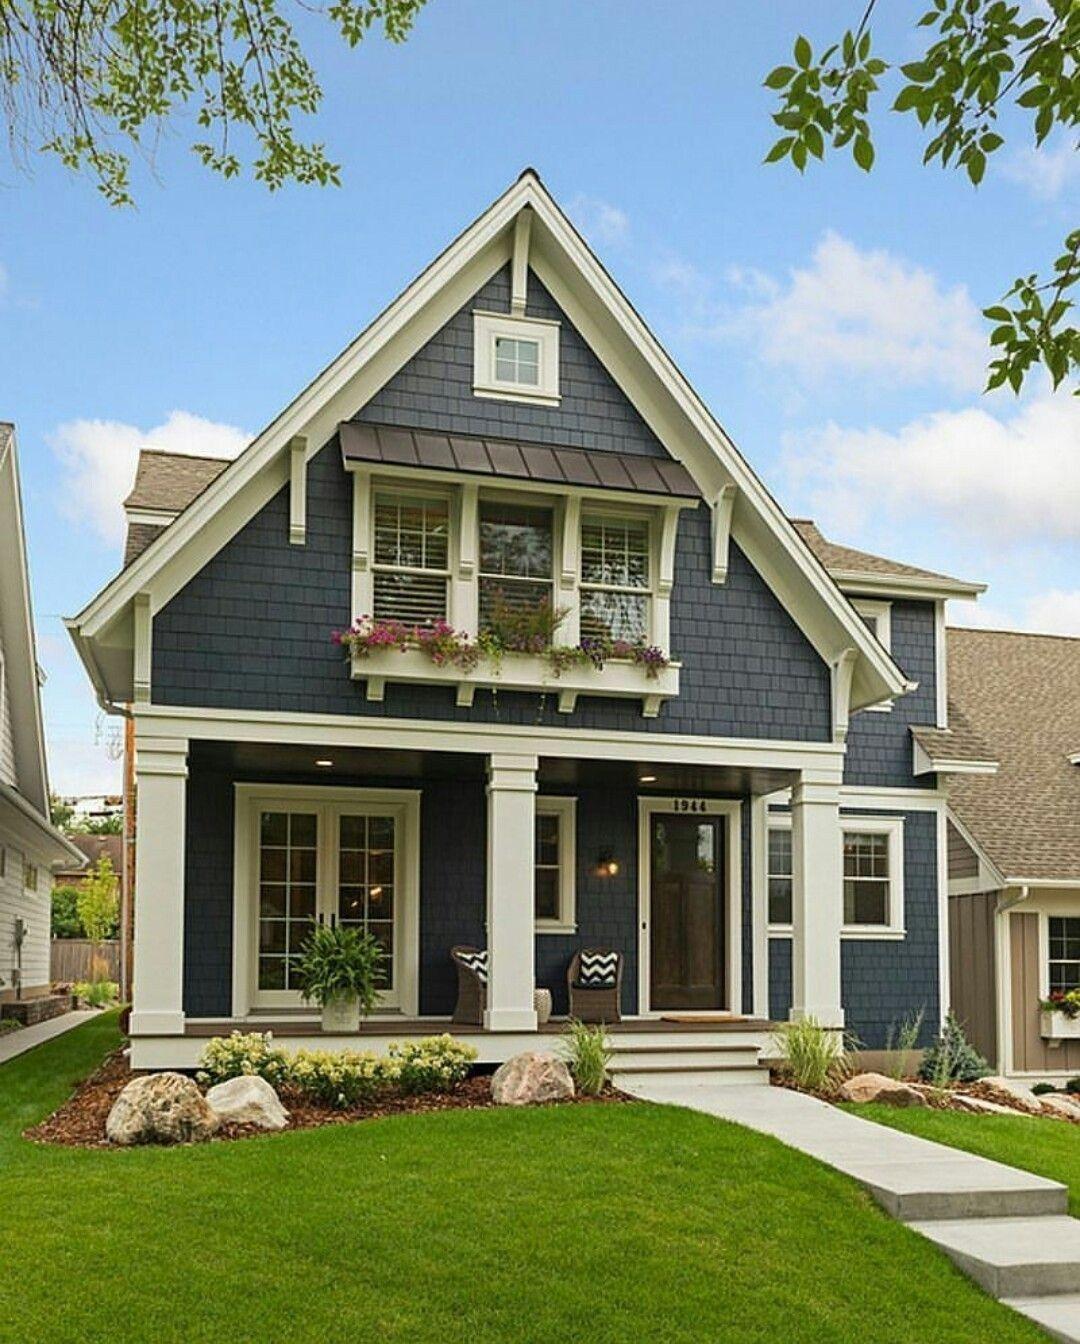 Unique Home Exterior Design: 48 Unique Farmhouse Exterior Design Ideas For Your Home